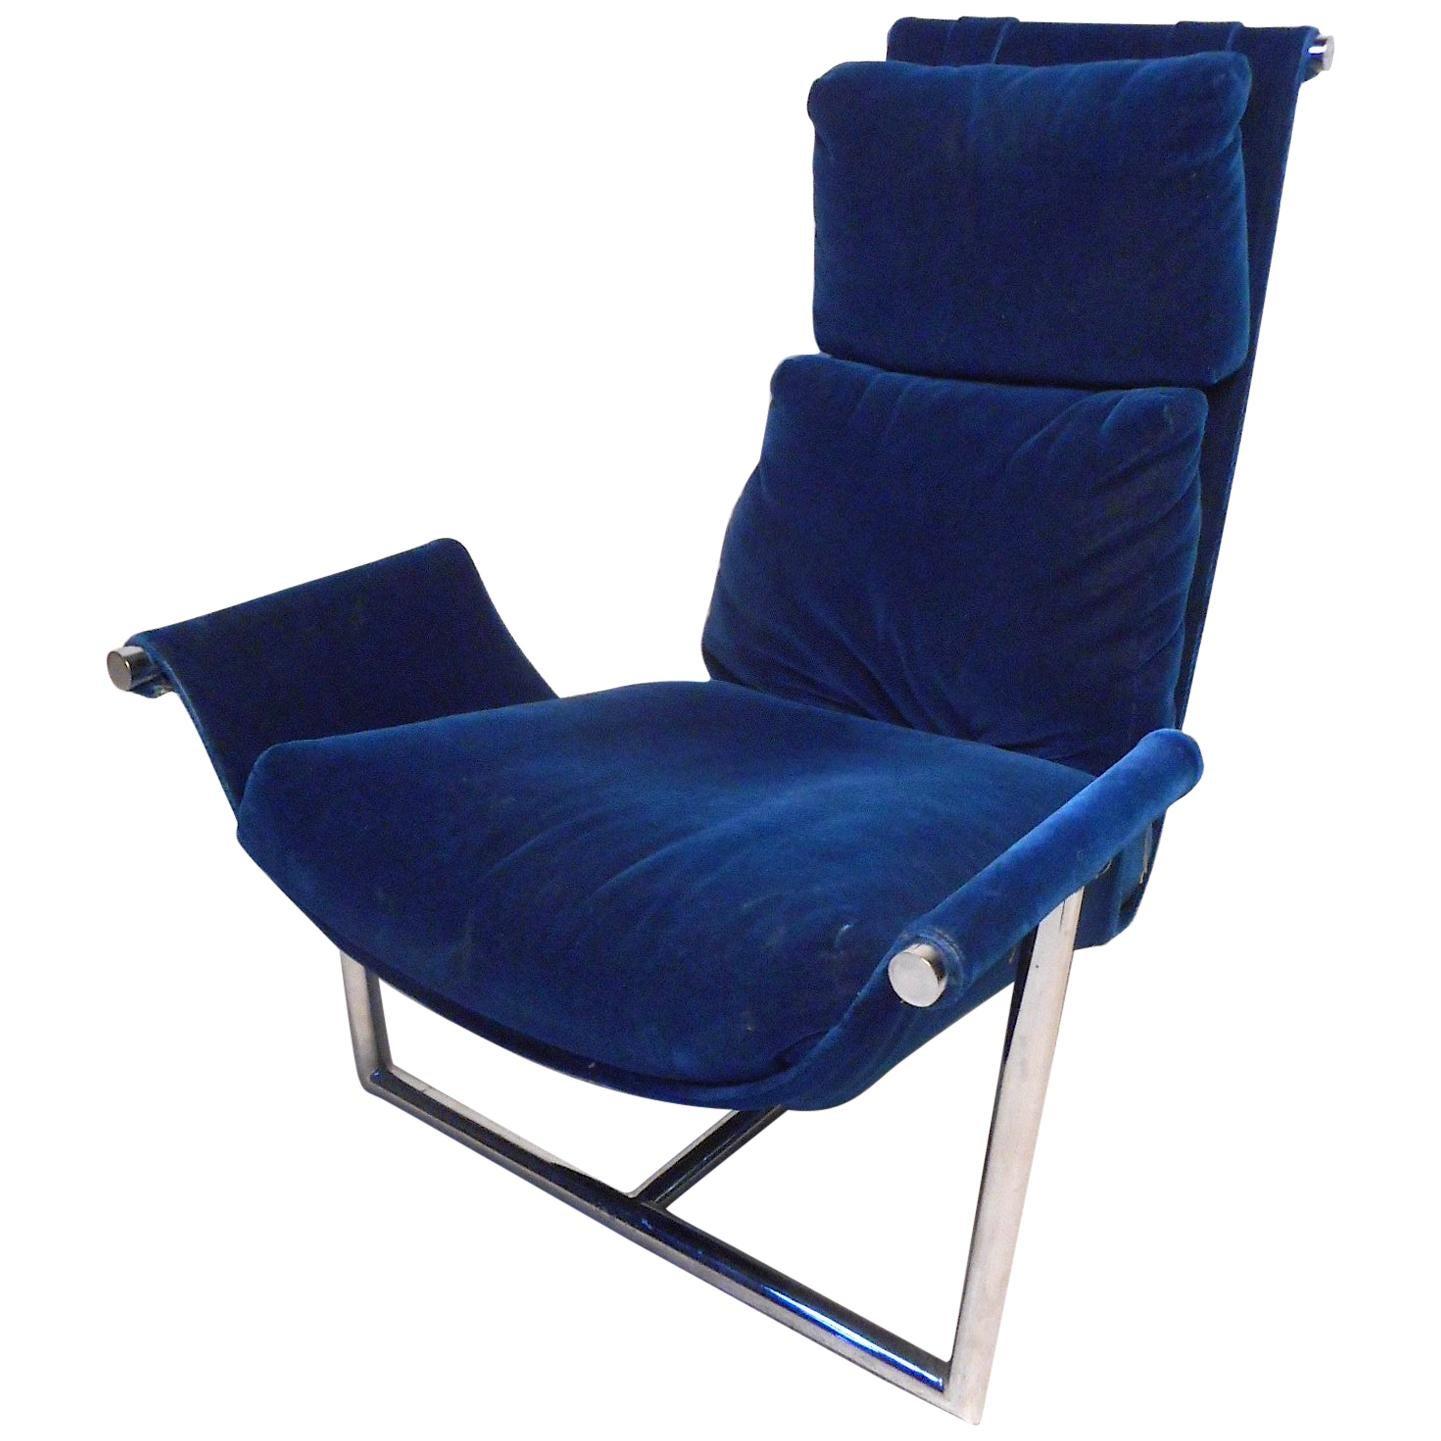 Unique Midcentury Sling Chair